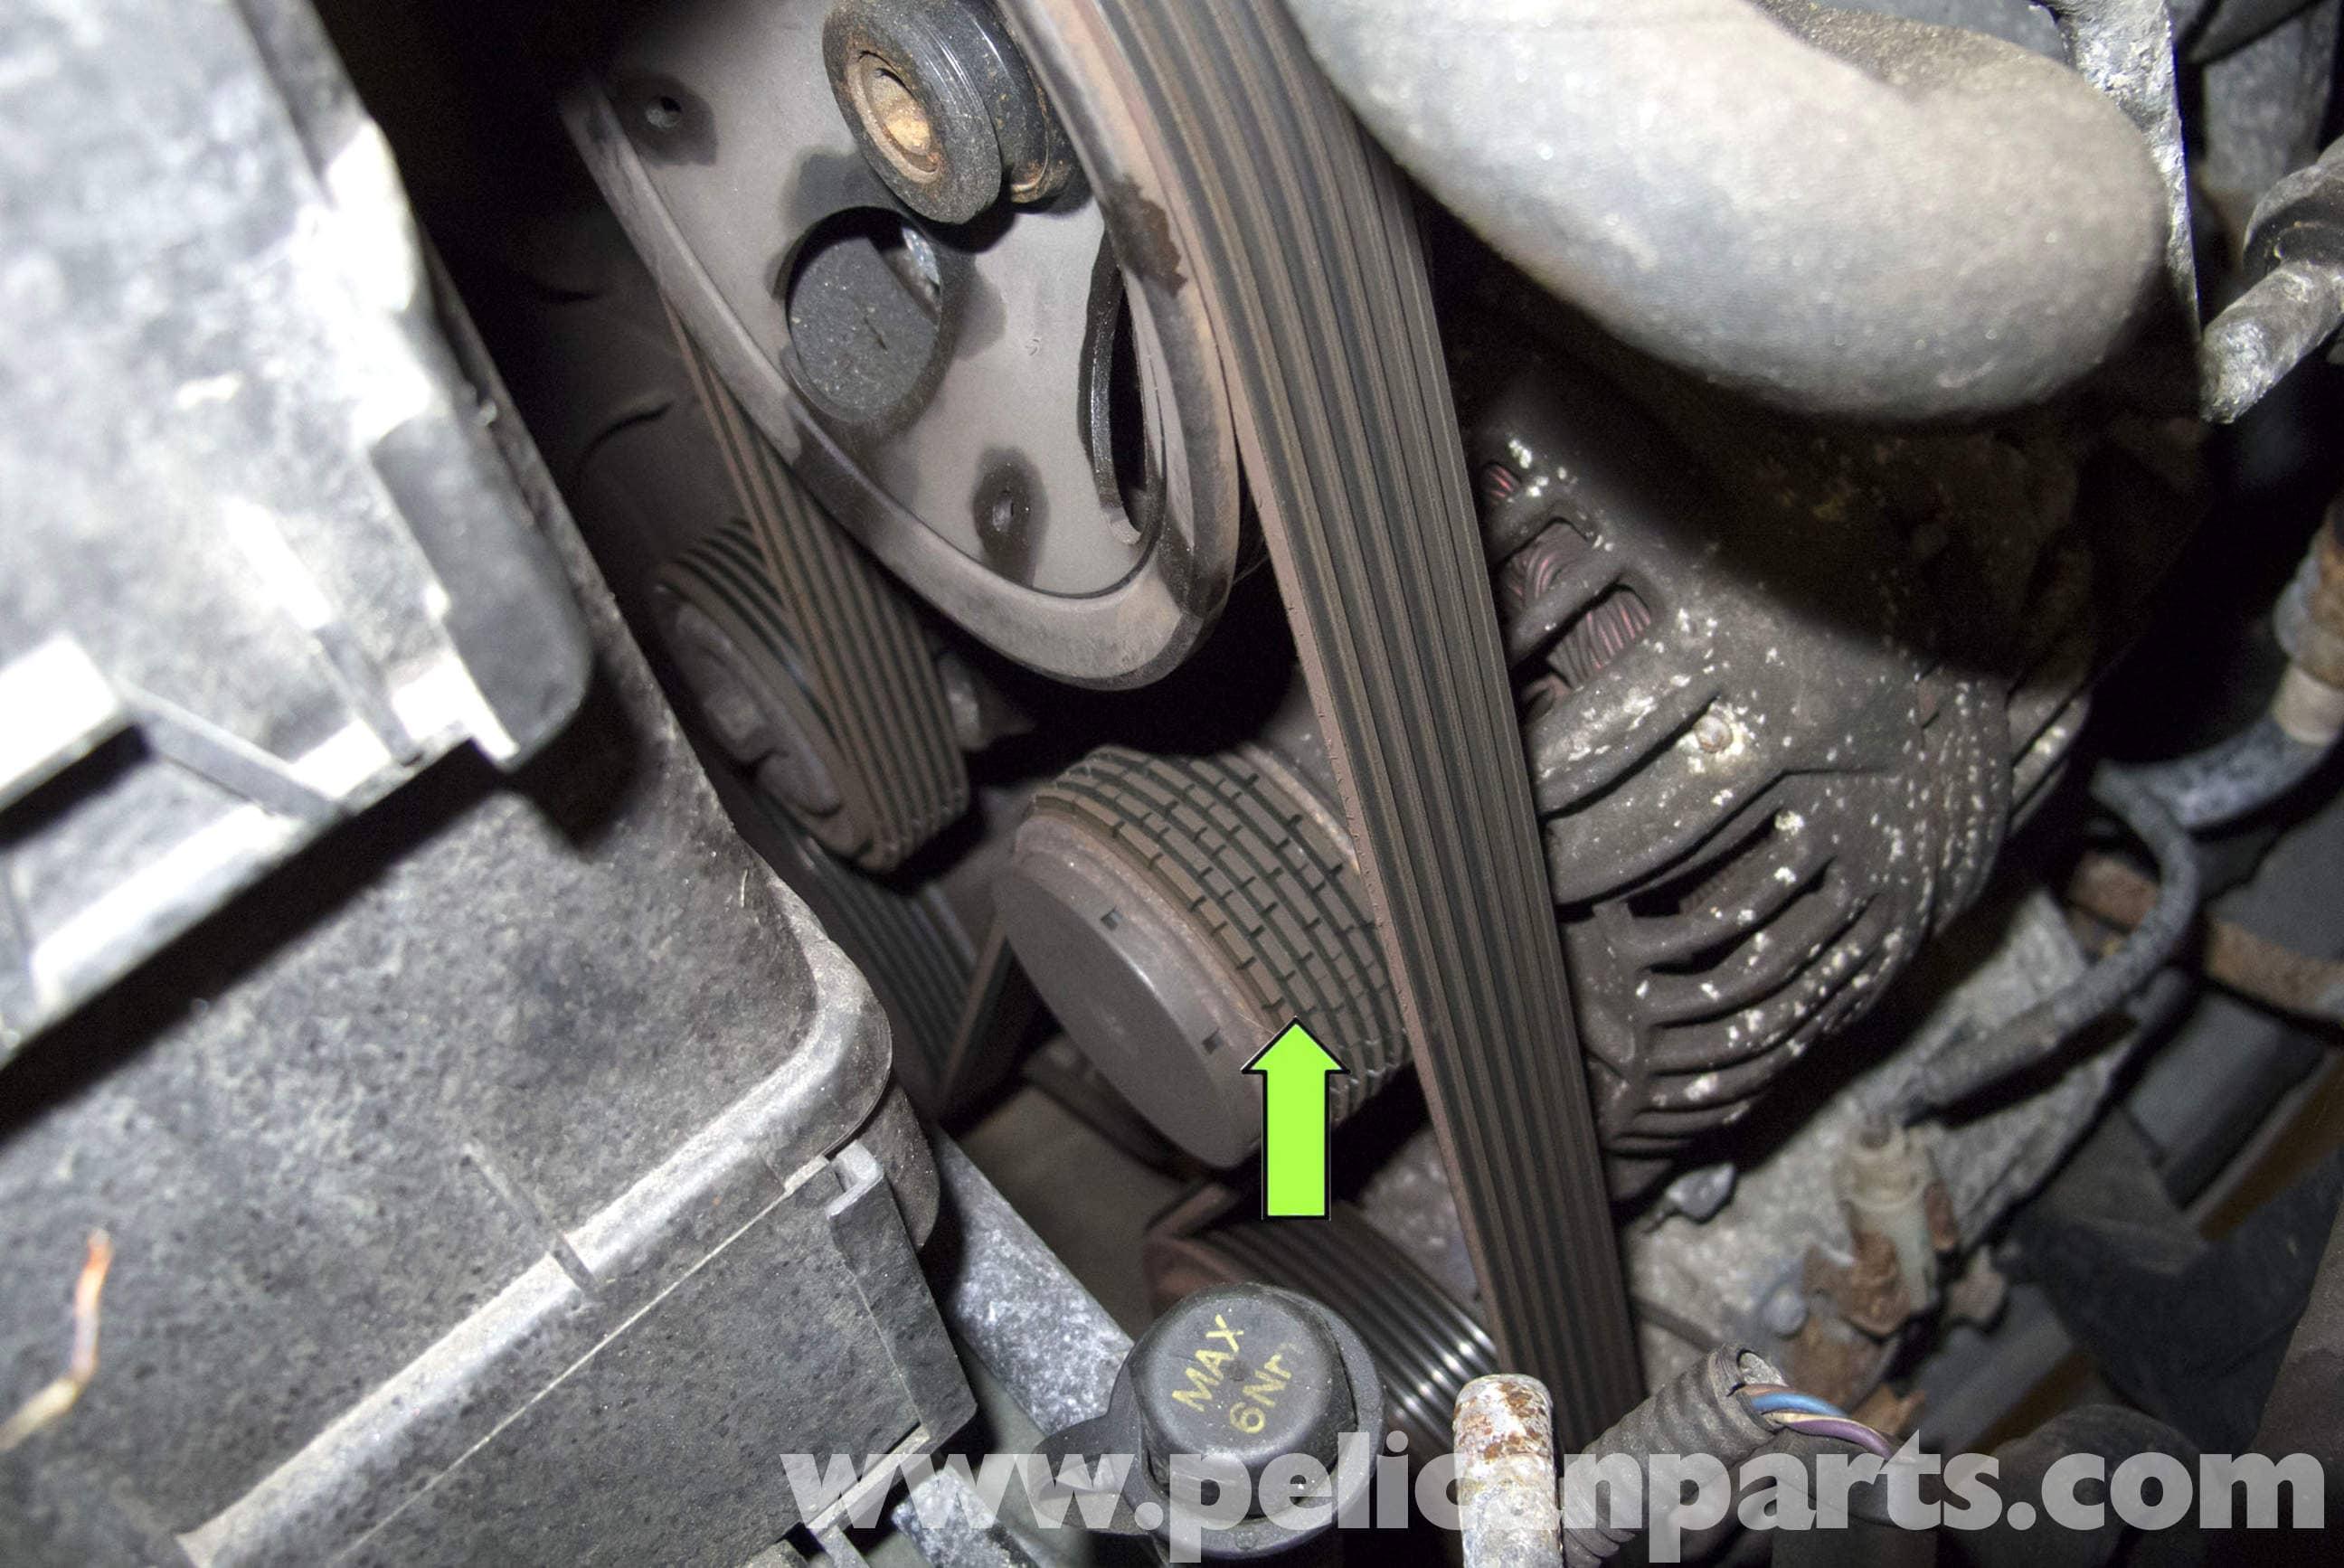 2006 Volvo Xc90 Wiring Diagram Volvo V70 Drive Belt Replacement 1998 2007 Pelican